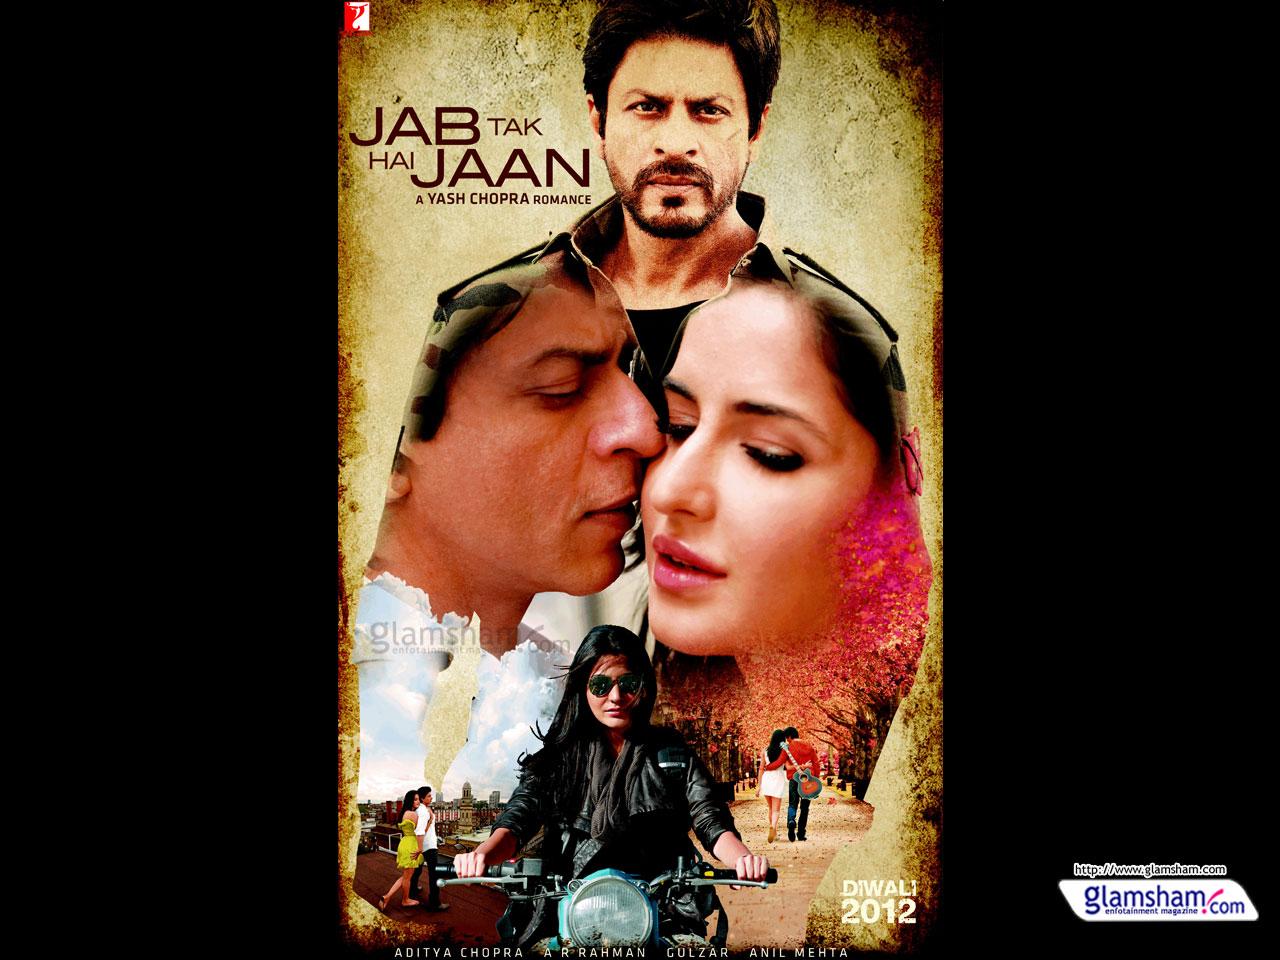 download film jab tak hai jaan bluray 720p sub indo